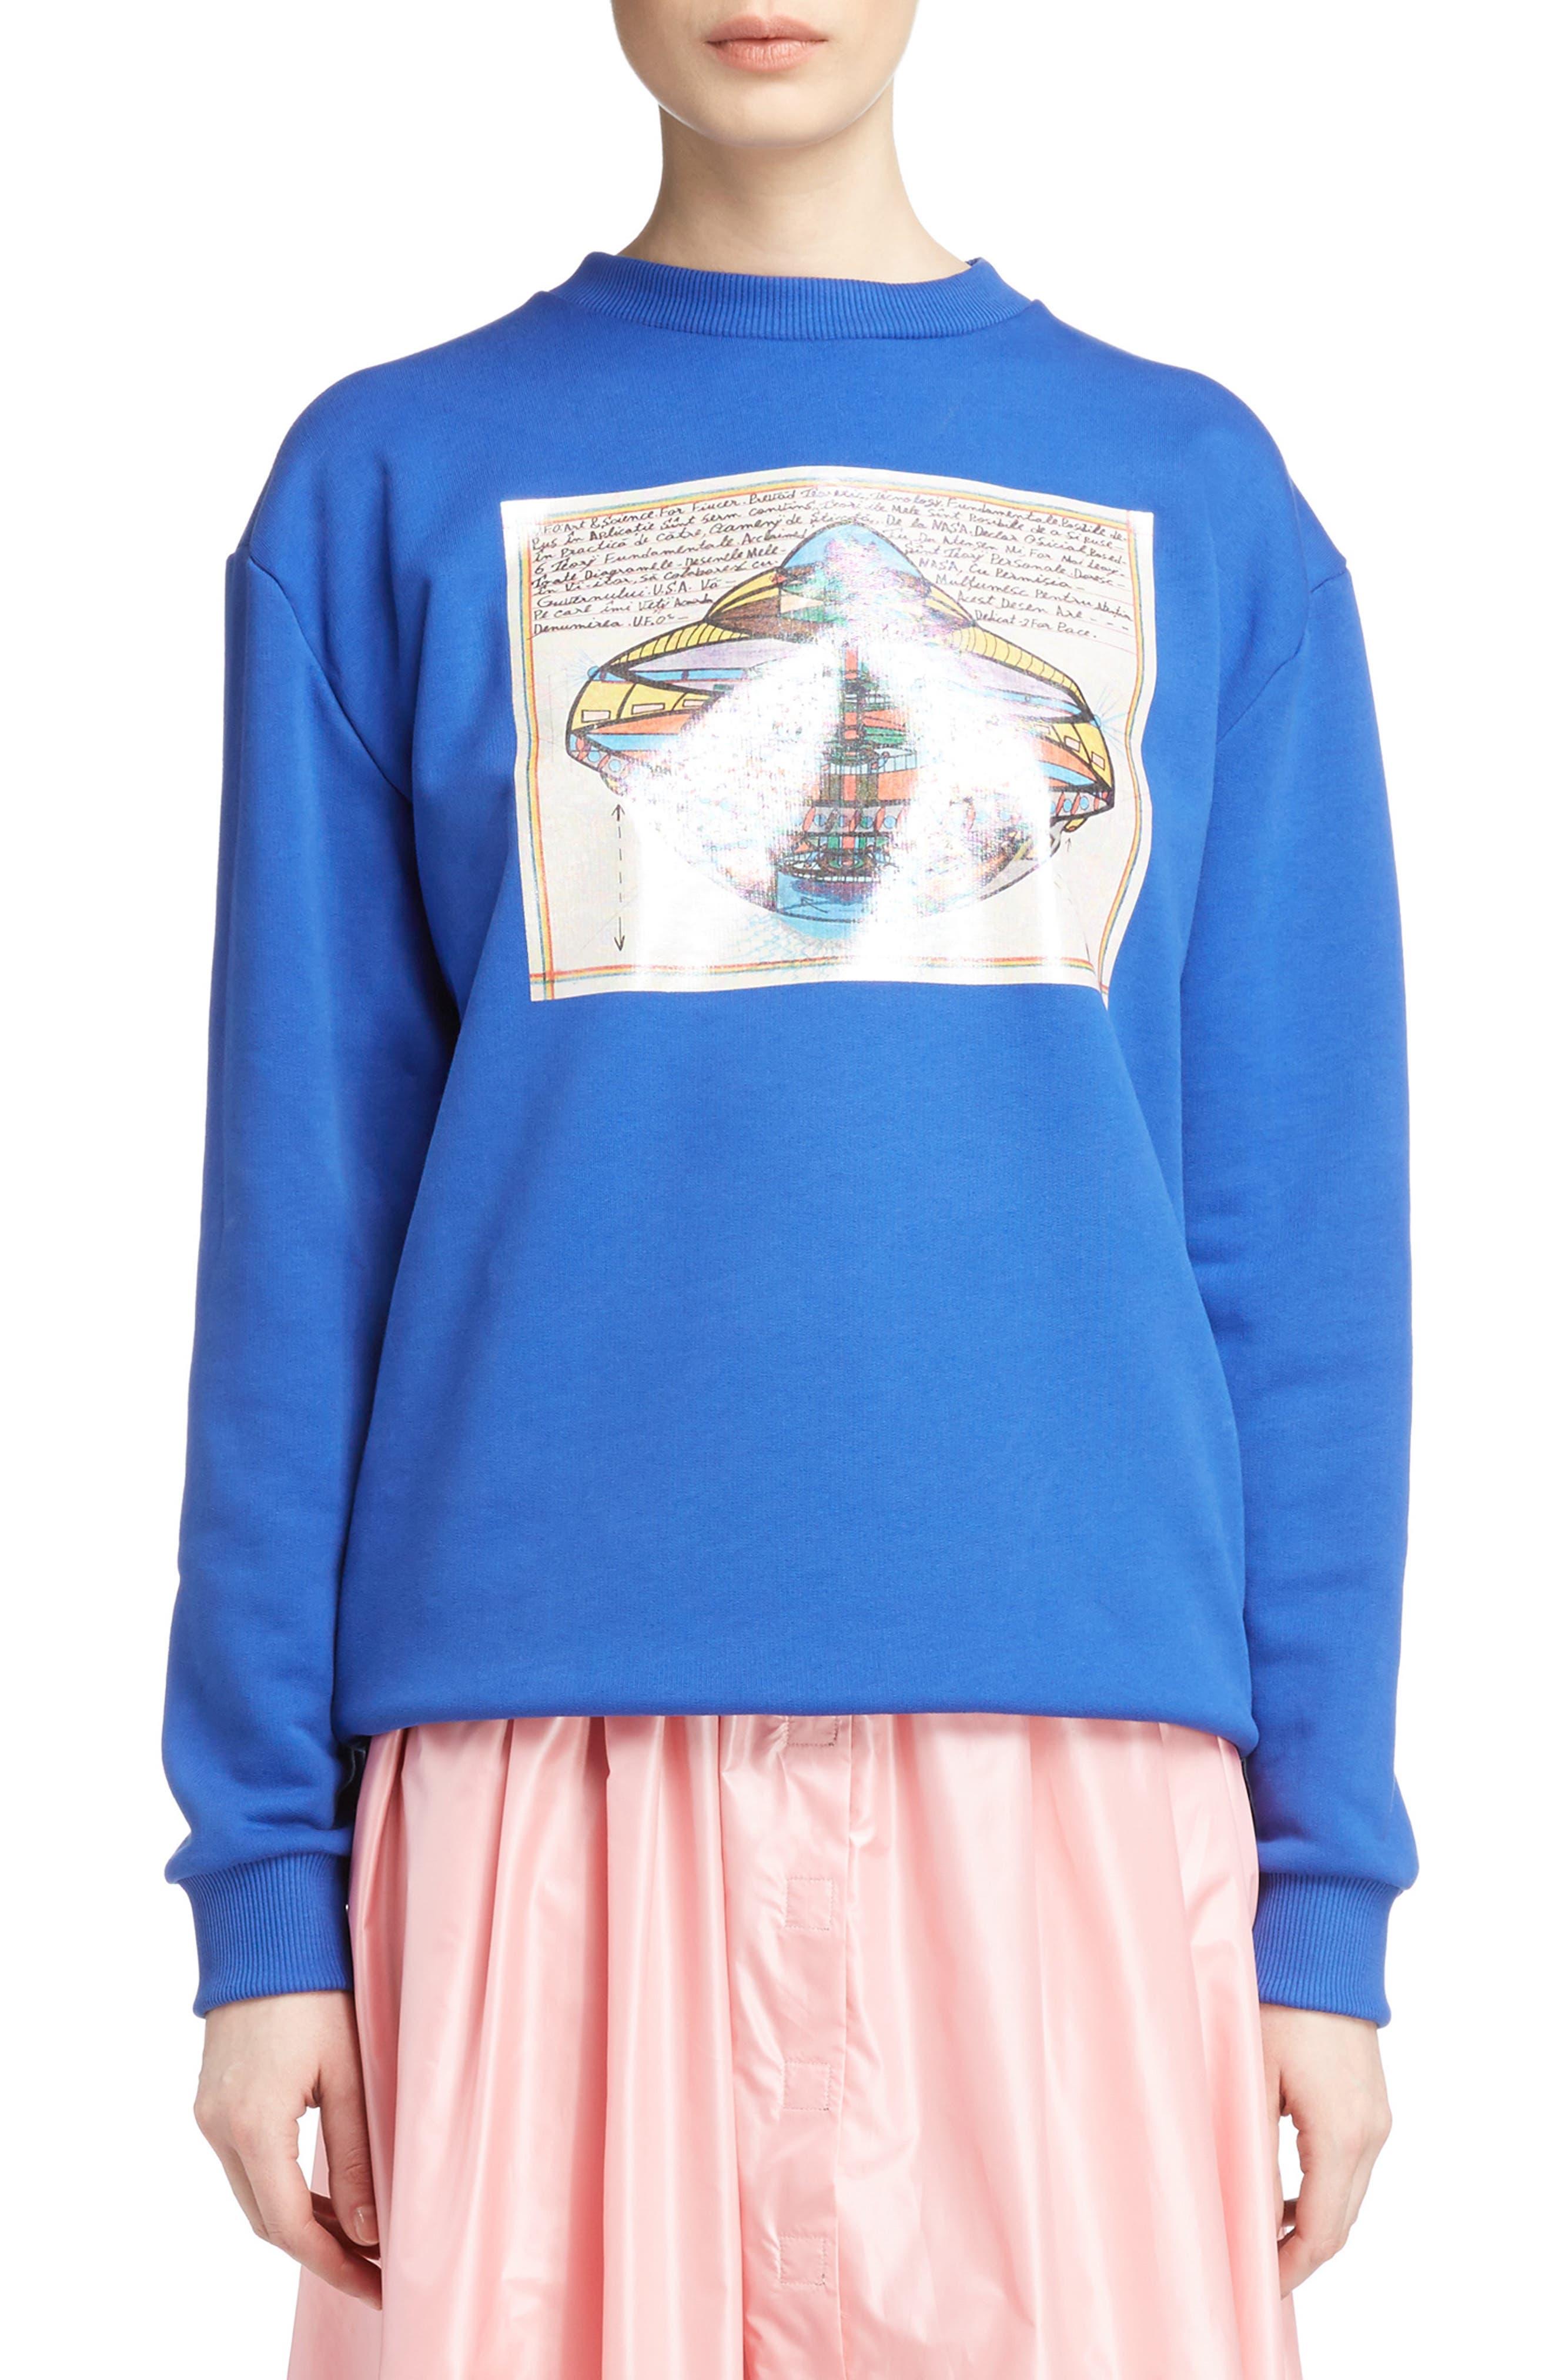 UFO Unisex Sweatshirt,                         Main,                         color, Blue